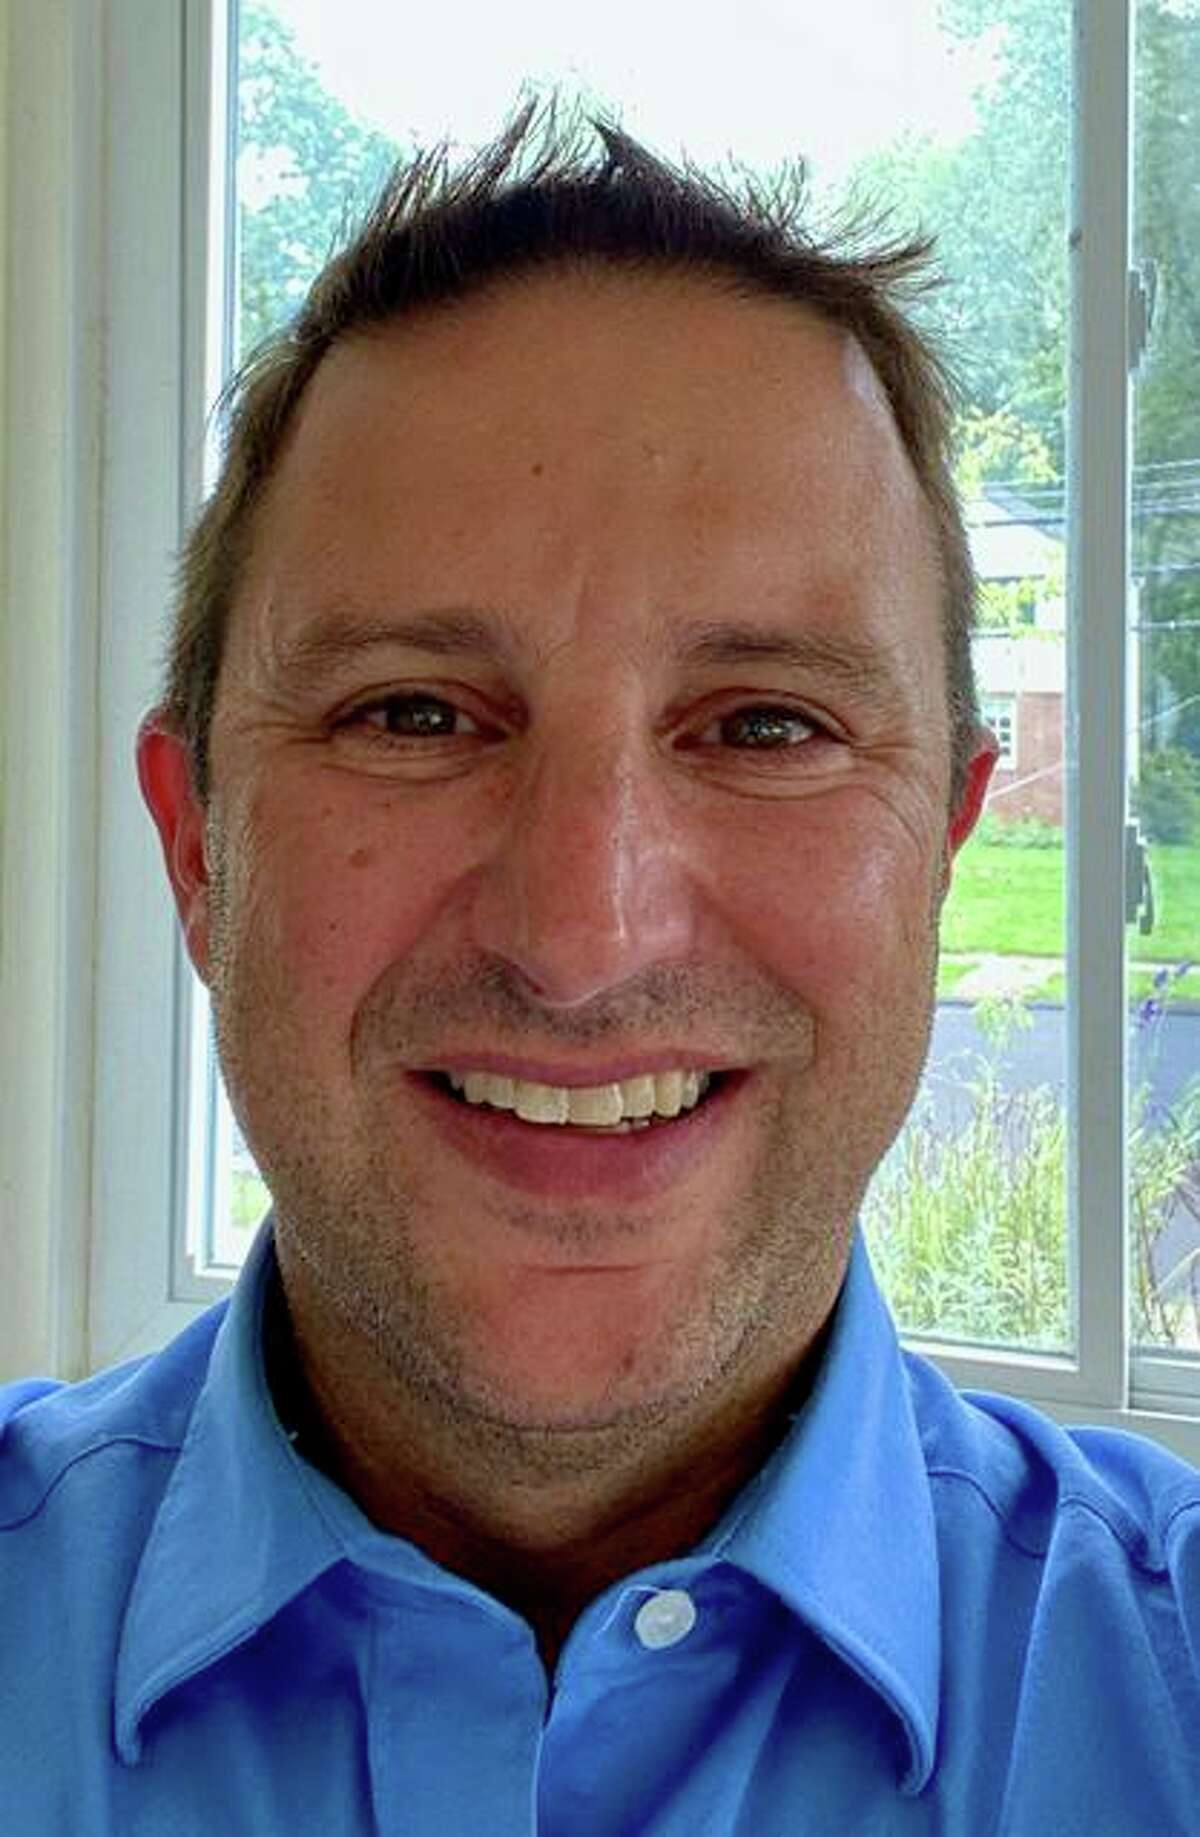 Ian Polun is the new principal at Fields Memorial School in Bozrah.